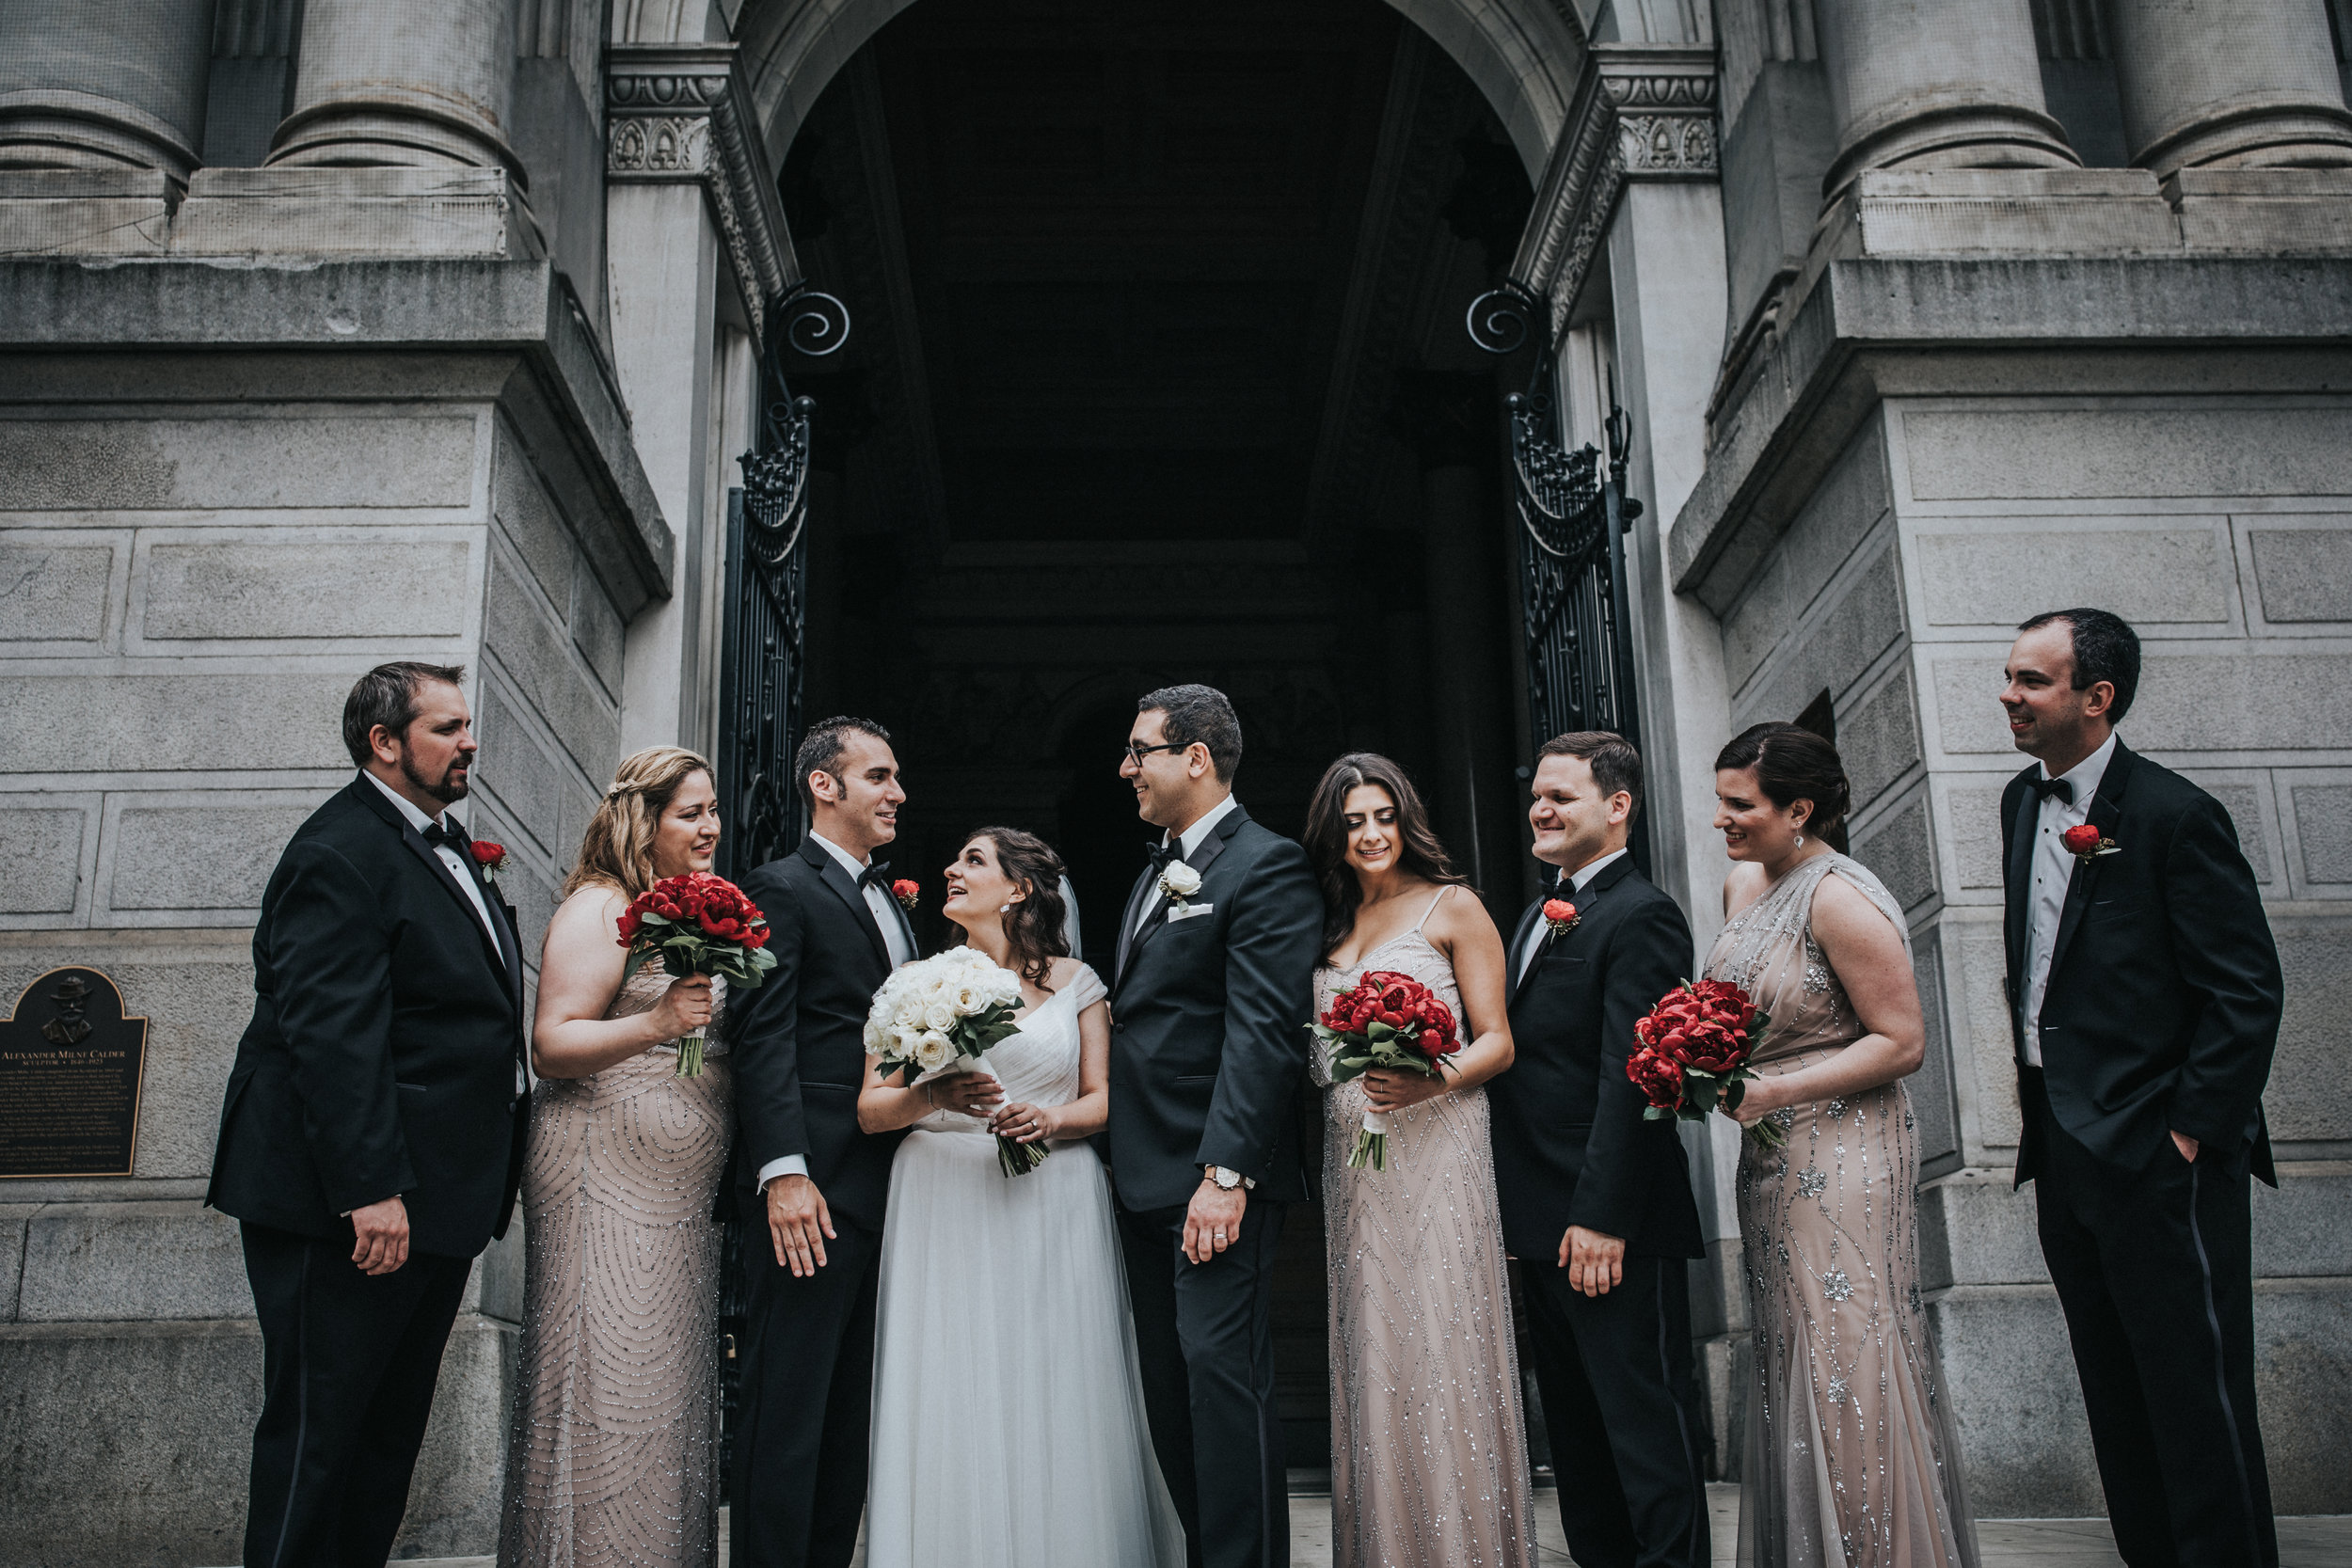 JennaLynnPhotography-NJWeddingPhotographer-Philadelphia-Wedding-ArtsBallroom-BridalParty-5.jpg